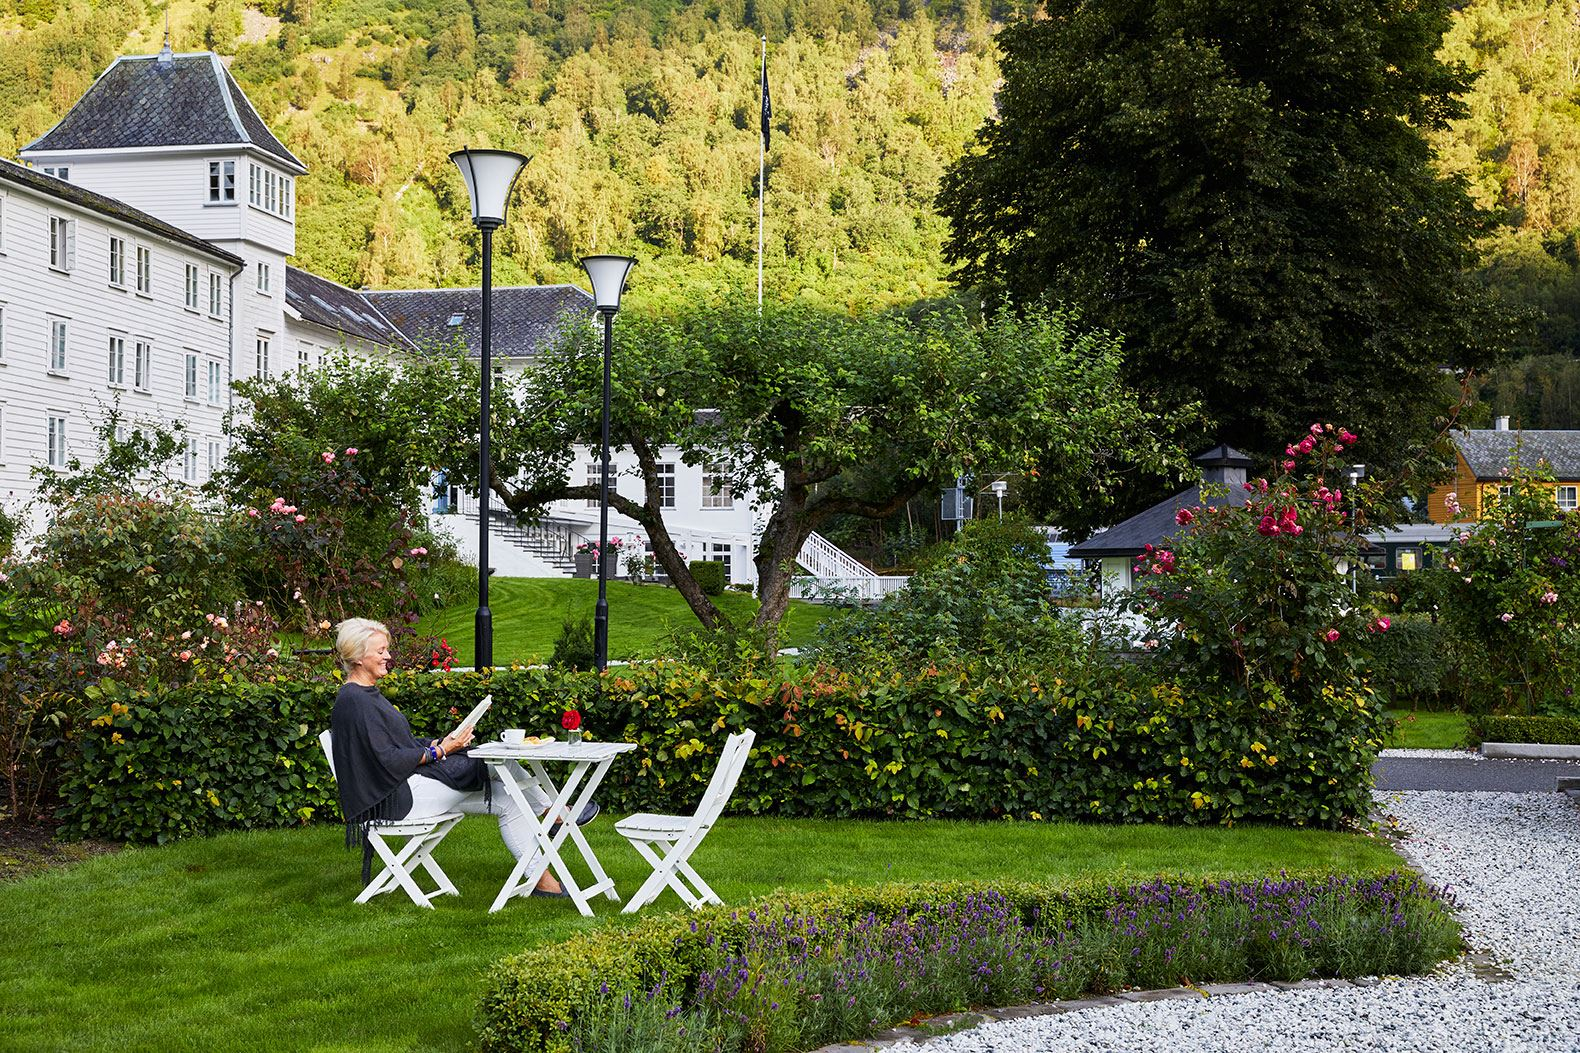 Ragnar Hartvig 2017, Fretheim Hotel, rose garden